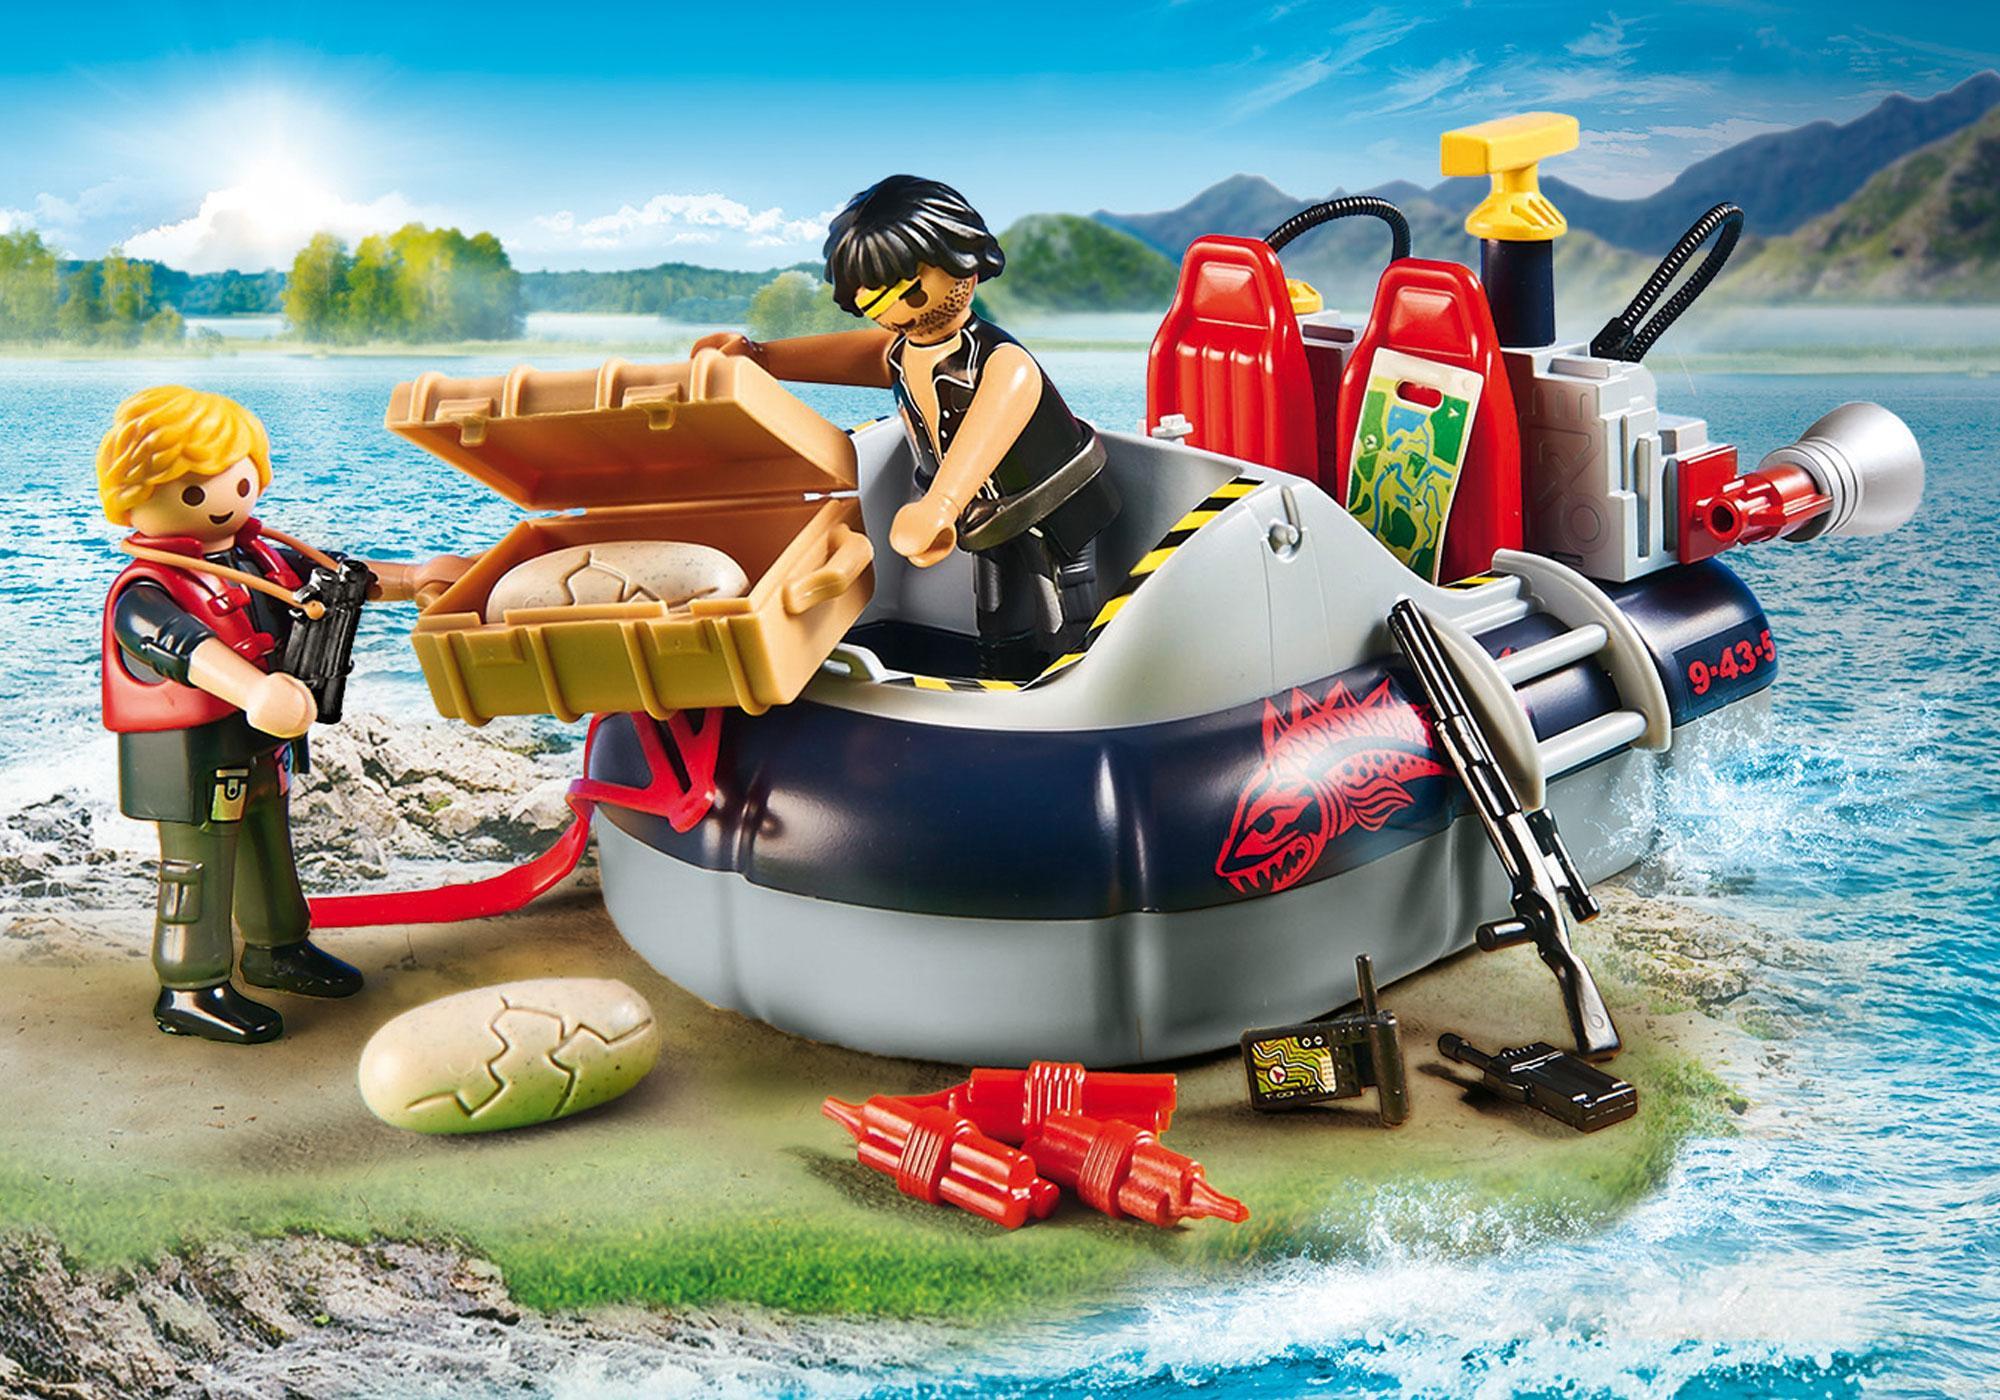 http://media.playmobil.com/i/playmobil/9435_product_extra2/Dino Hovercraft with Underwater Motor